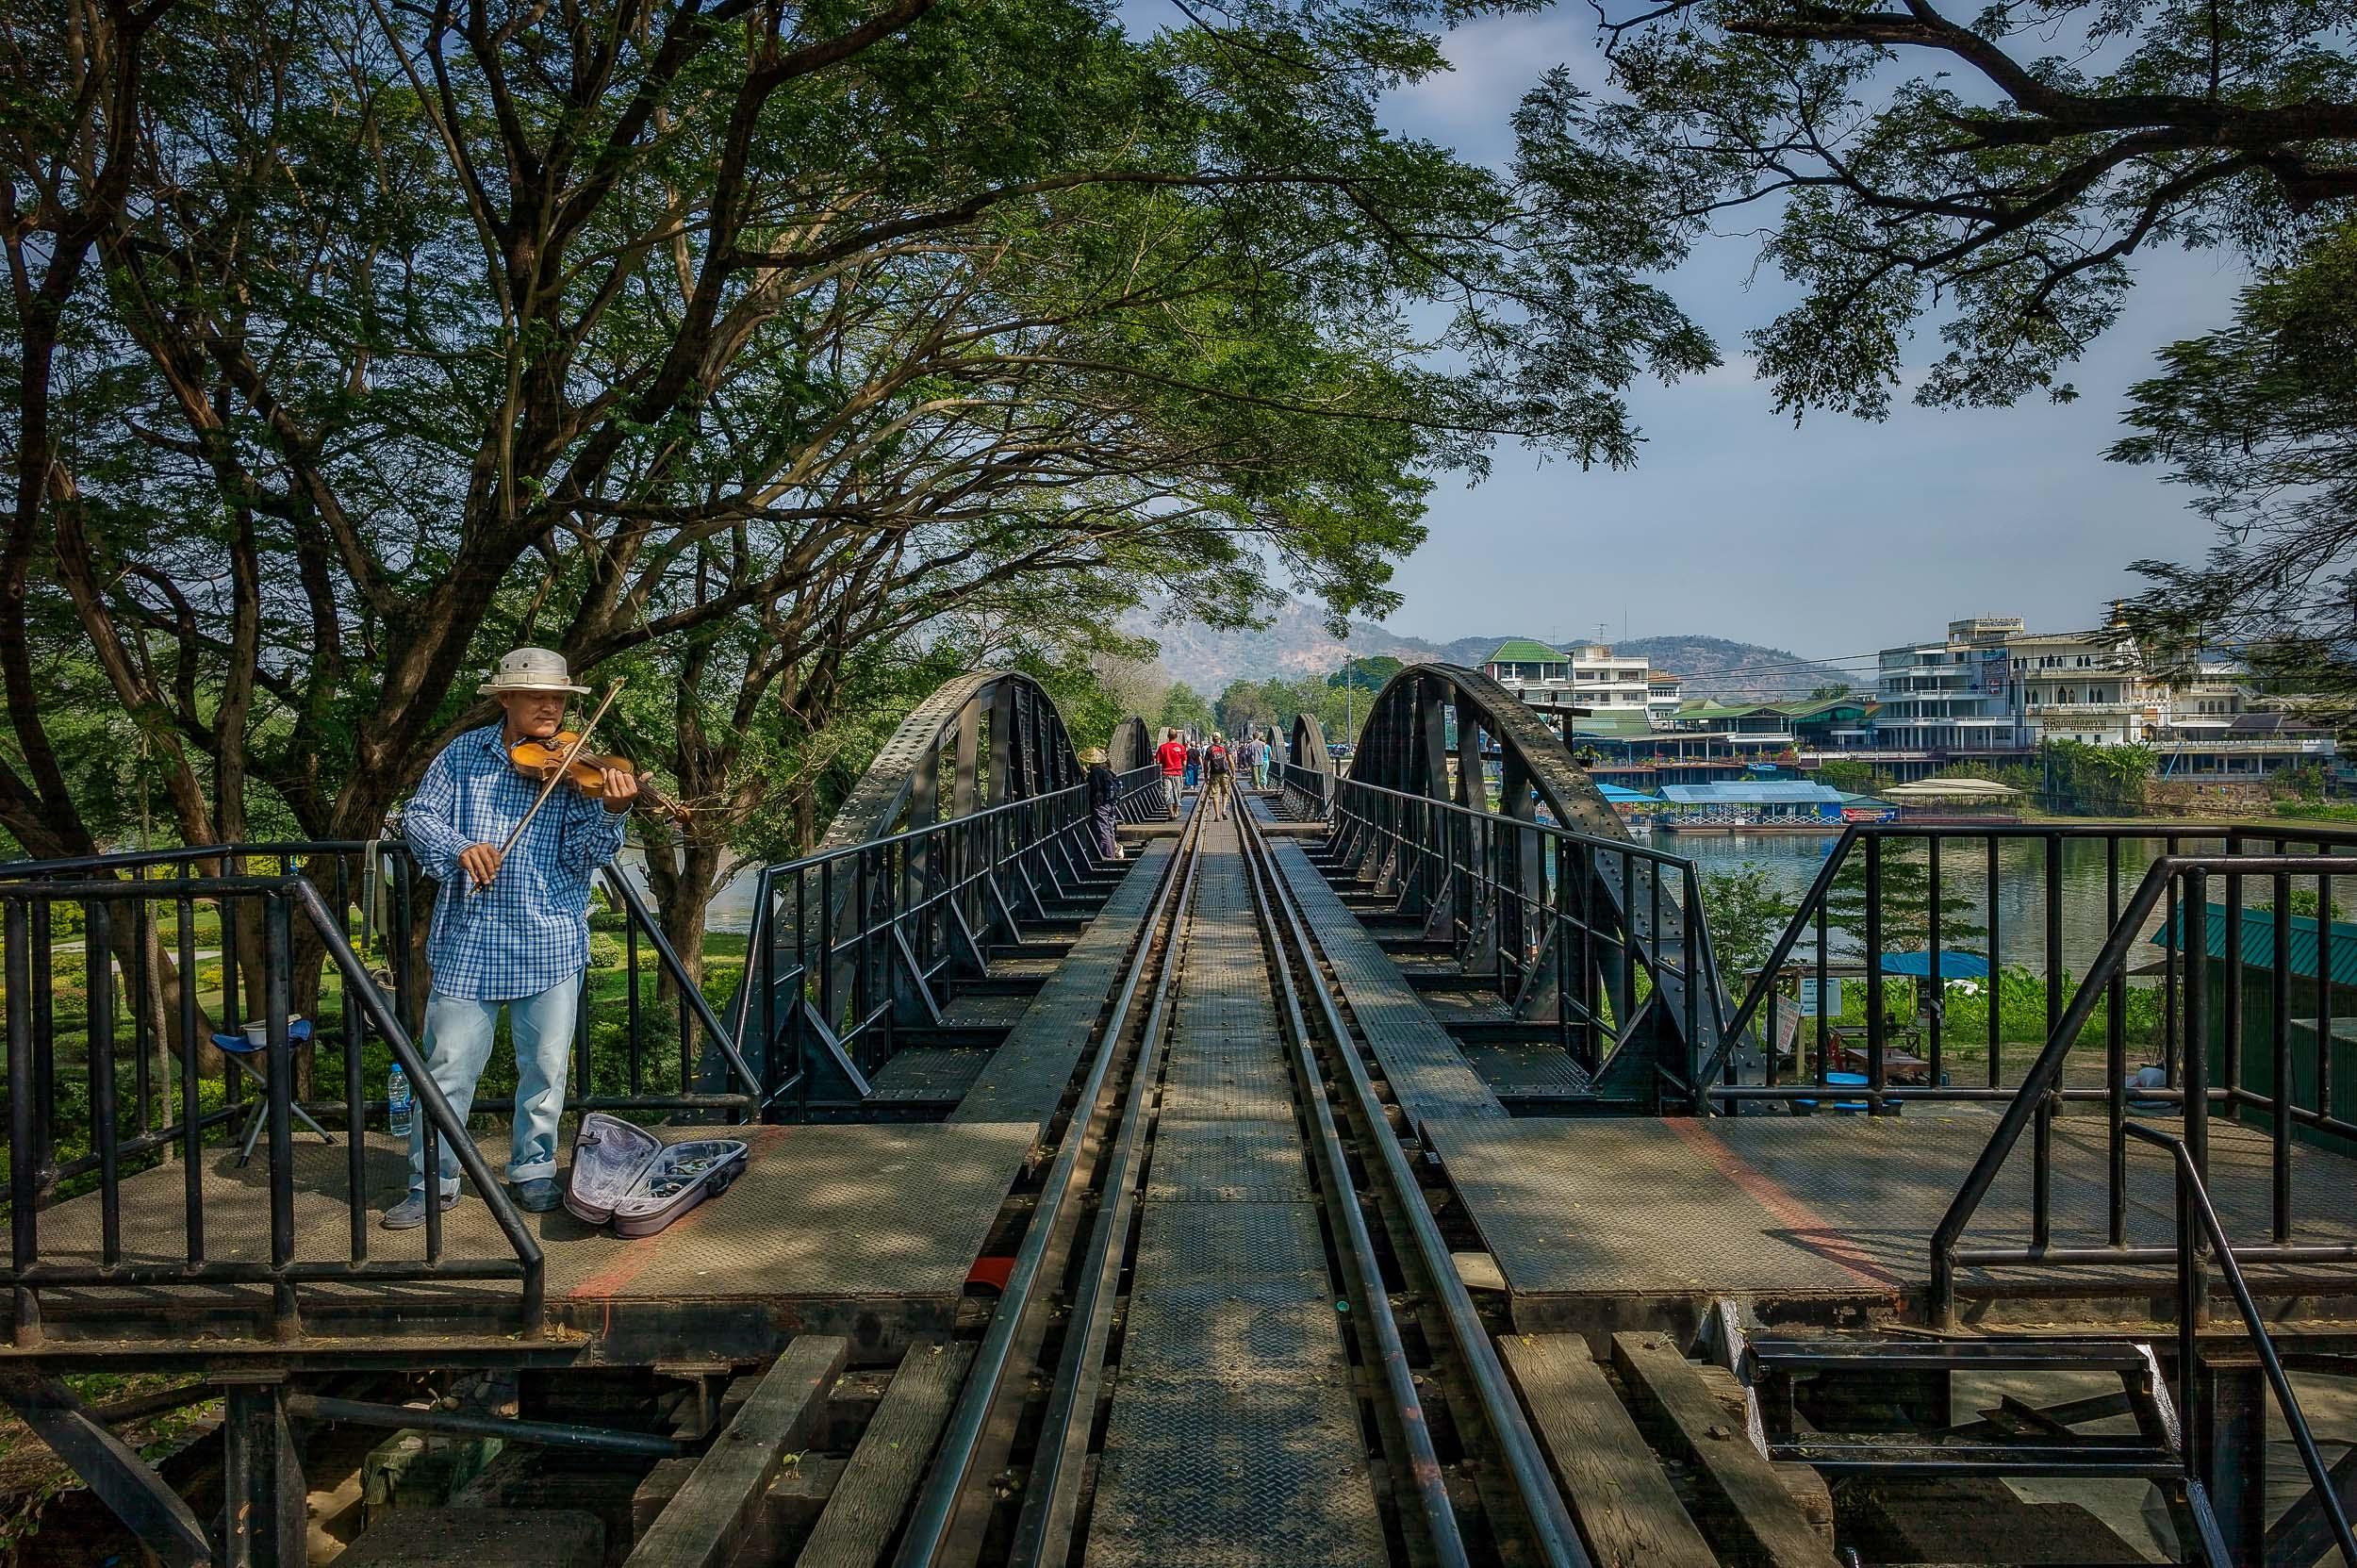 A  busker playing violin  on the  Bridge On The River Kwai  near  Kanchanaburi  in  Thailand .